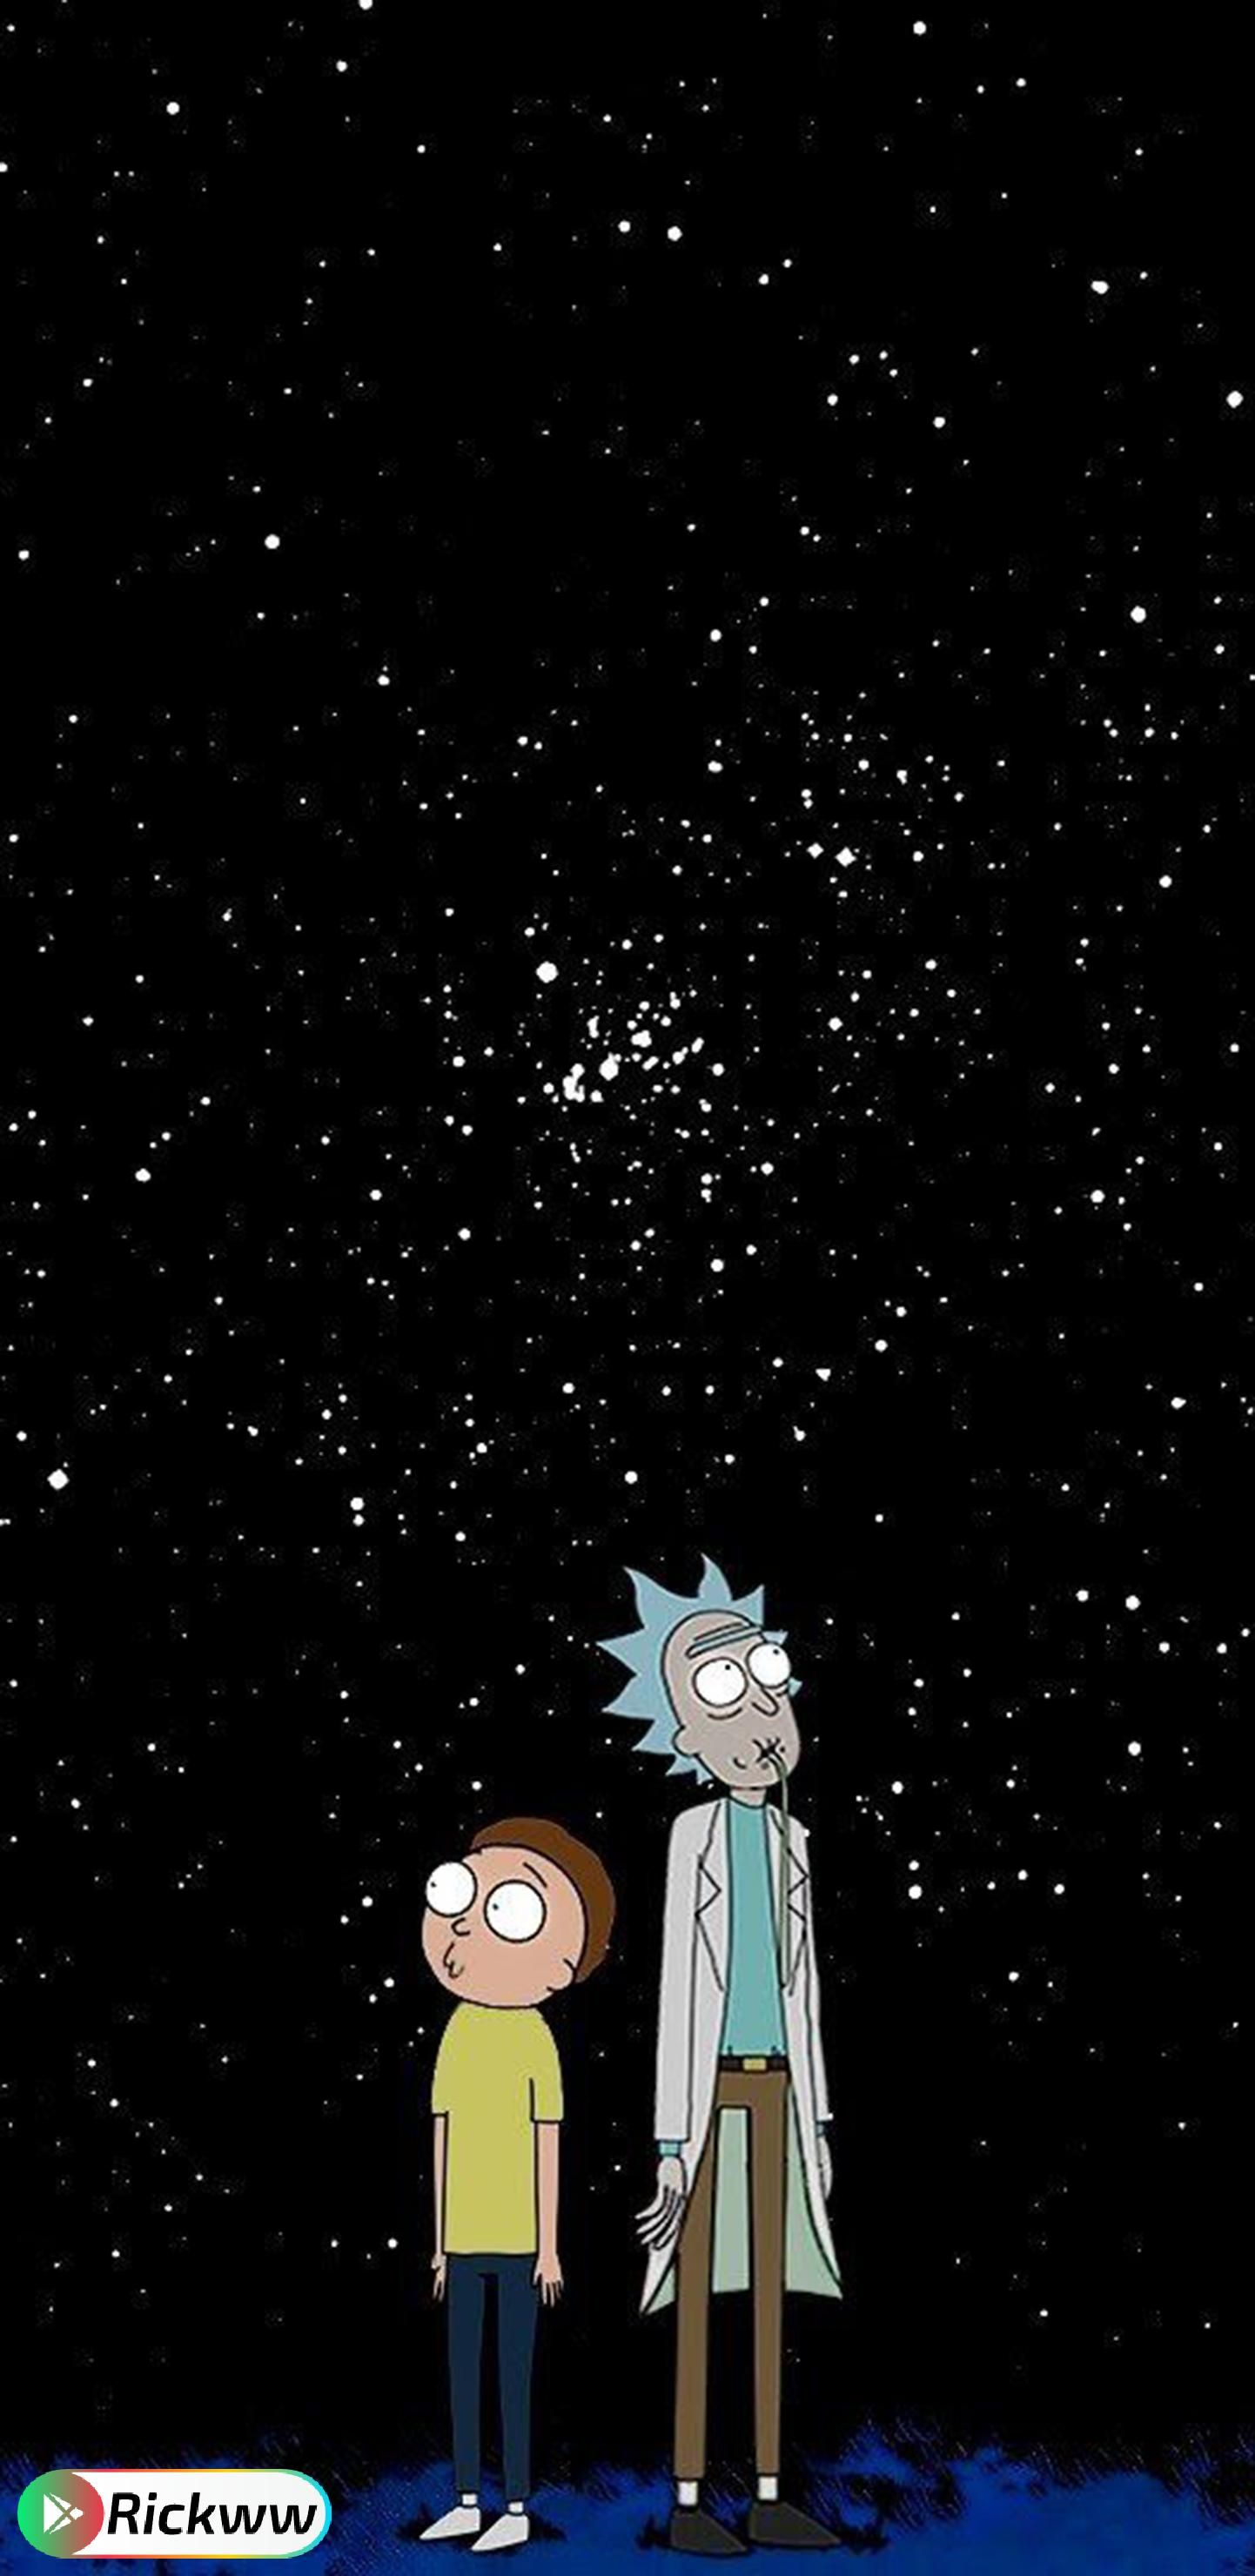 Rick Morty Wallpaper Rick And Morty Poster Iphone Wallpaper Rick And Morty Rick And Morty Tattoo